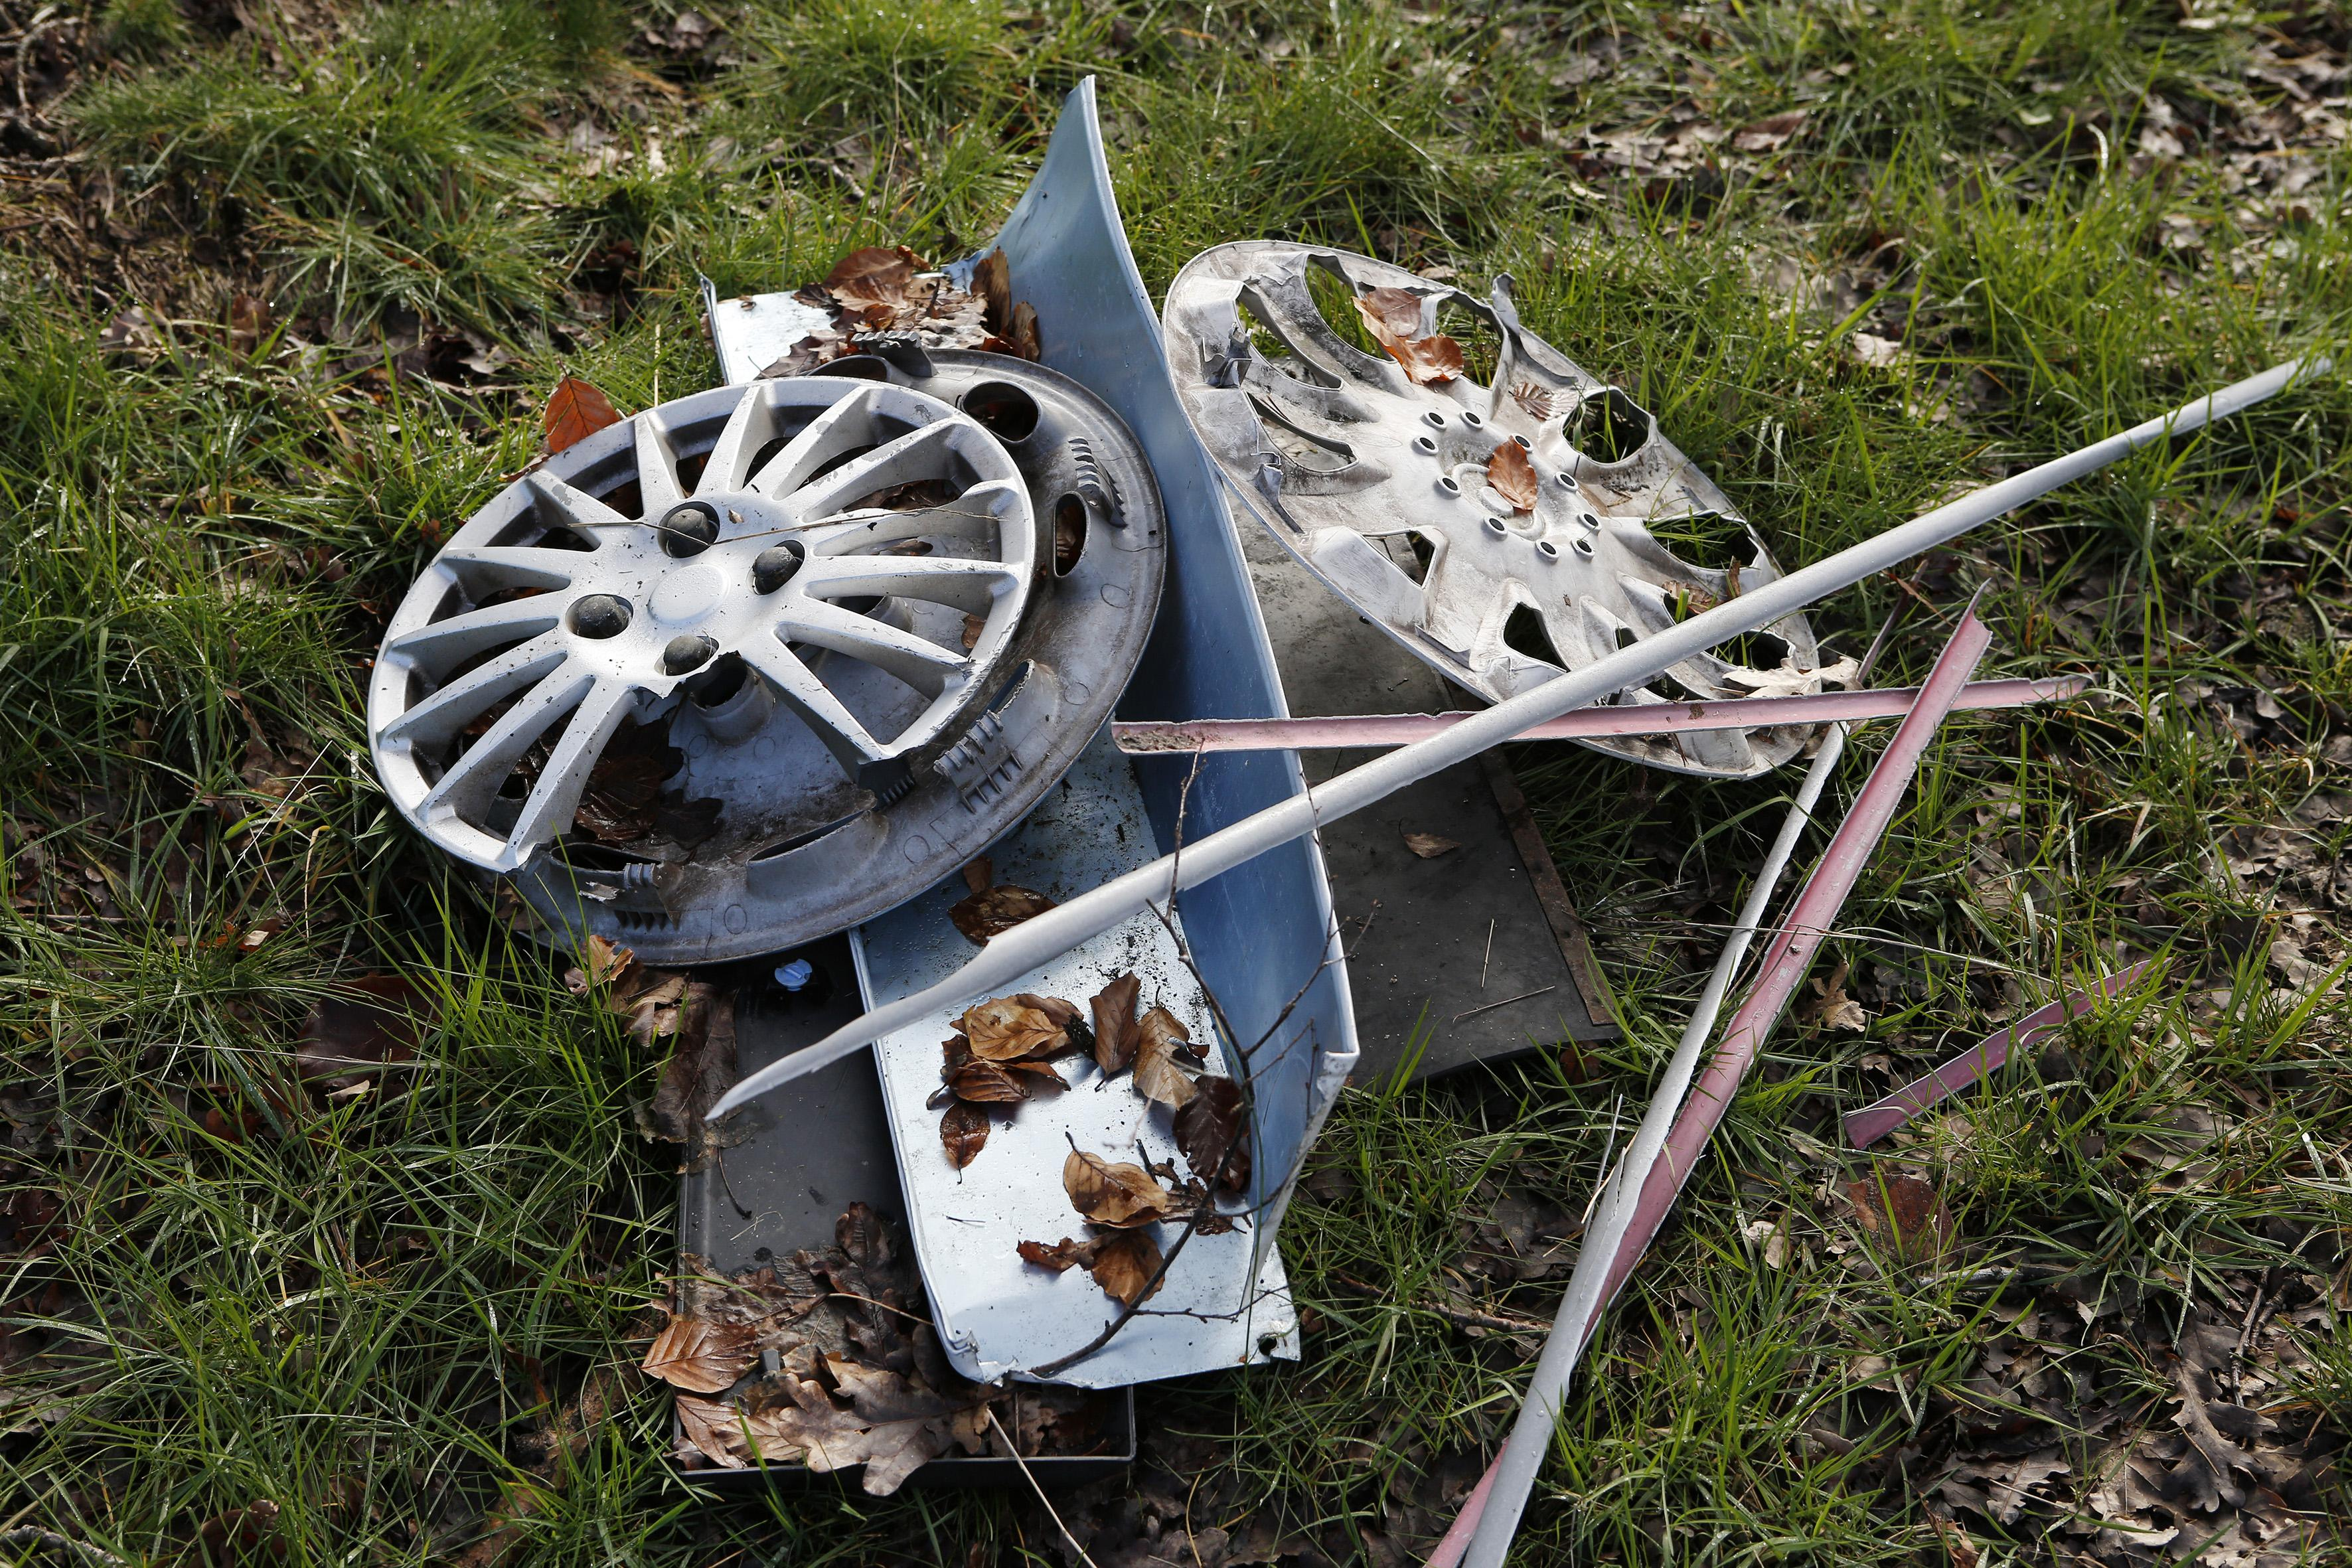 Situatie zwerfvuil in Gooi is onverminderd slecht. Bermbende raapt op eerste dag honderden kilo's afval